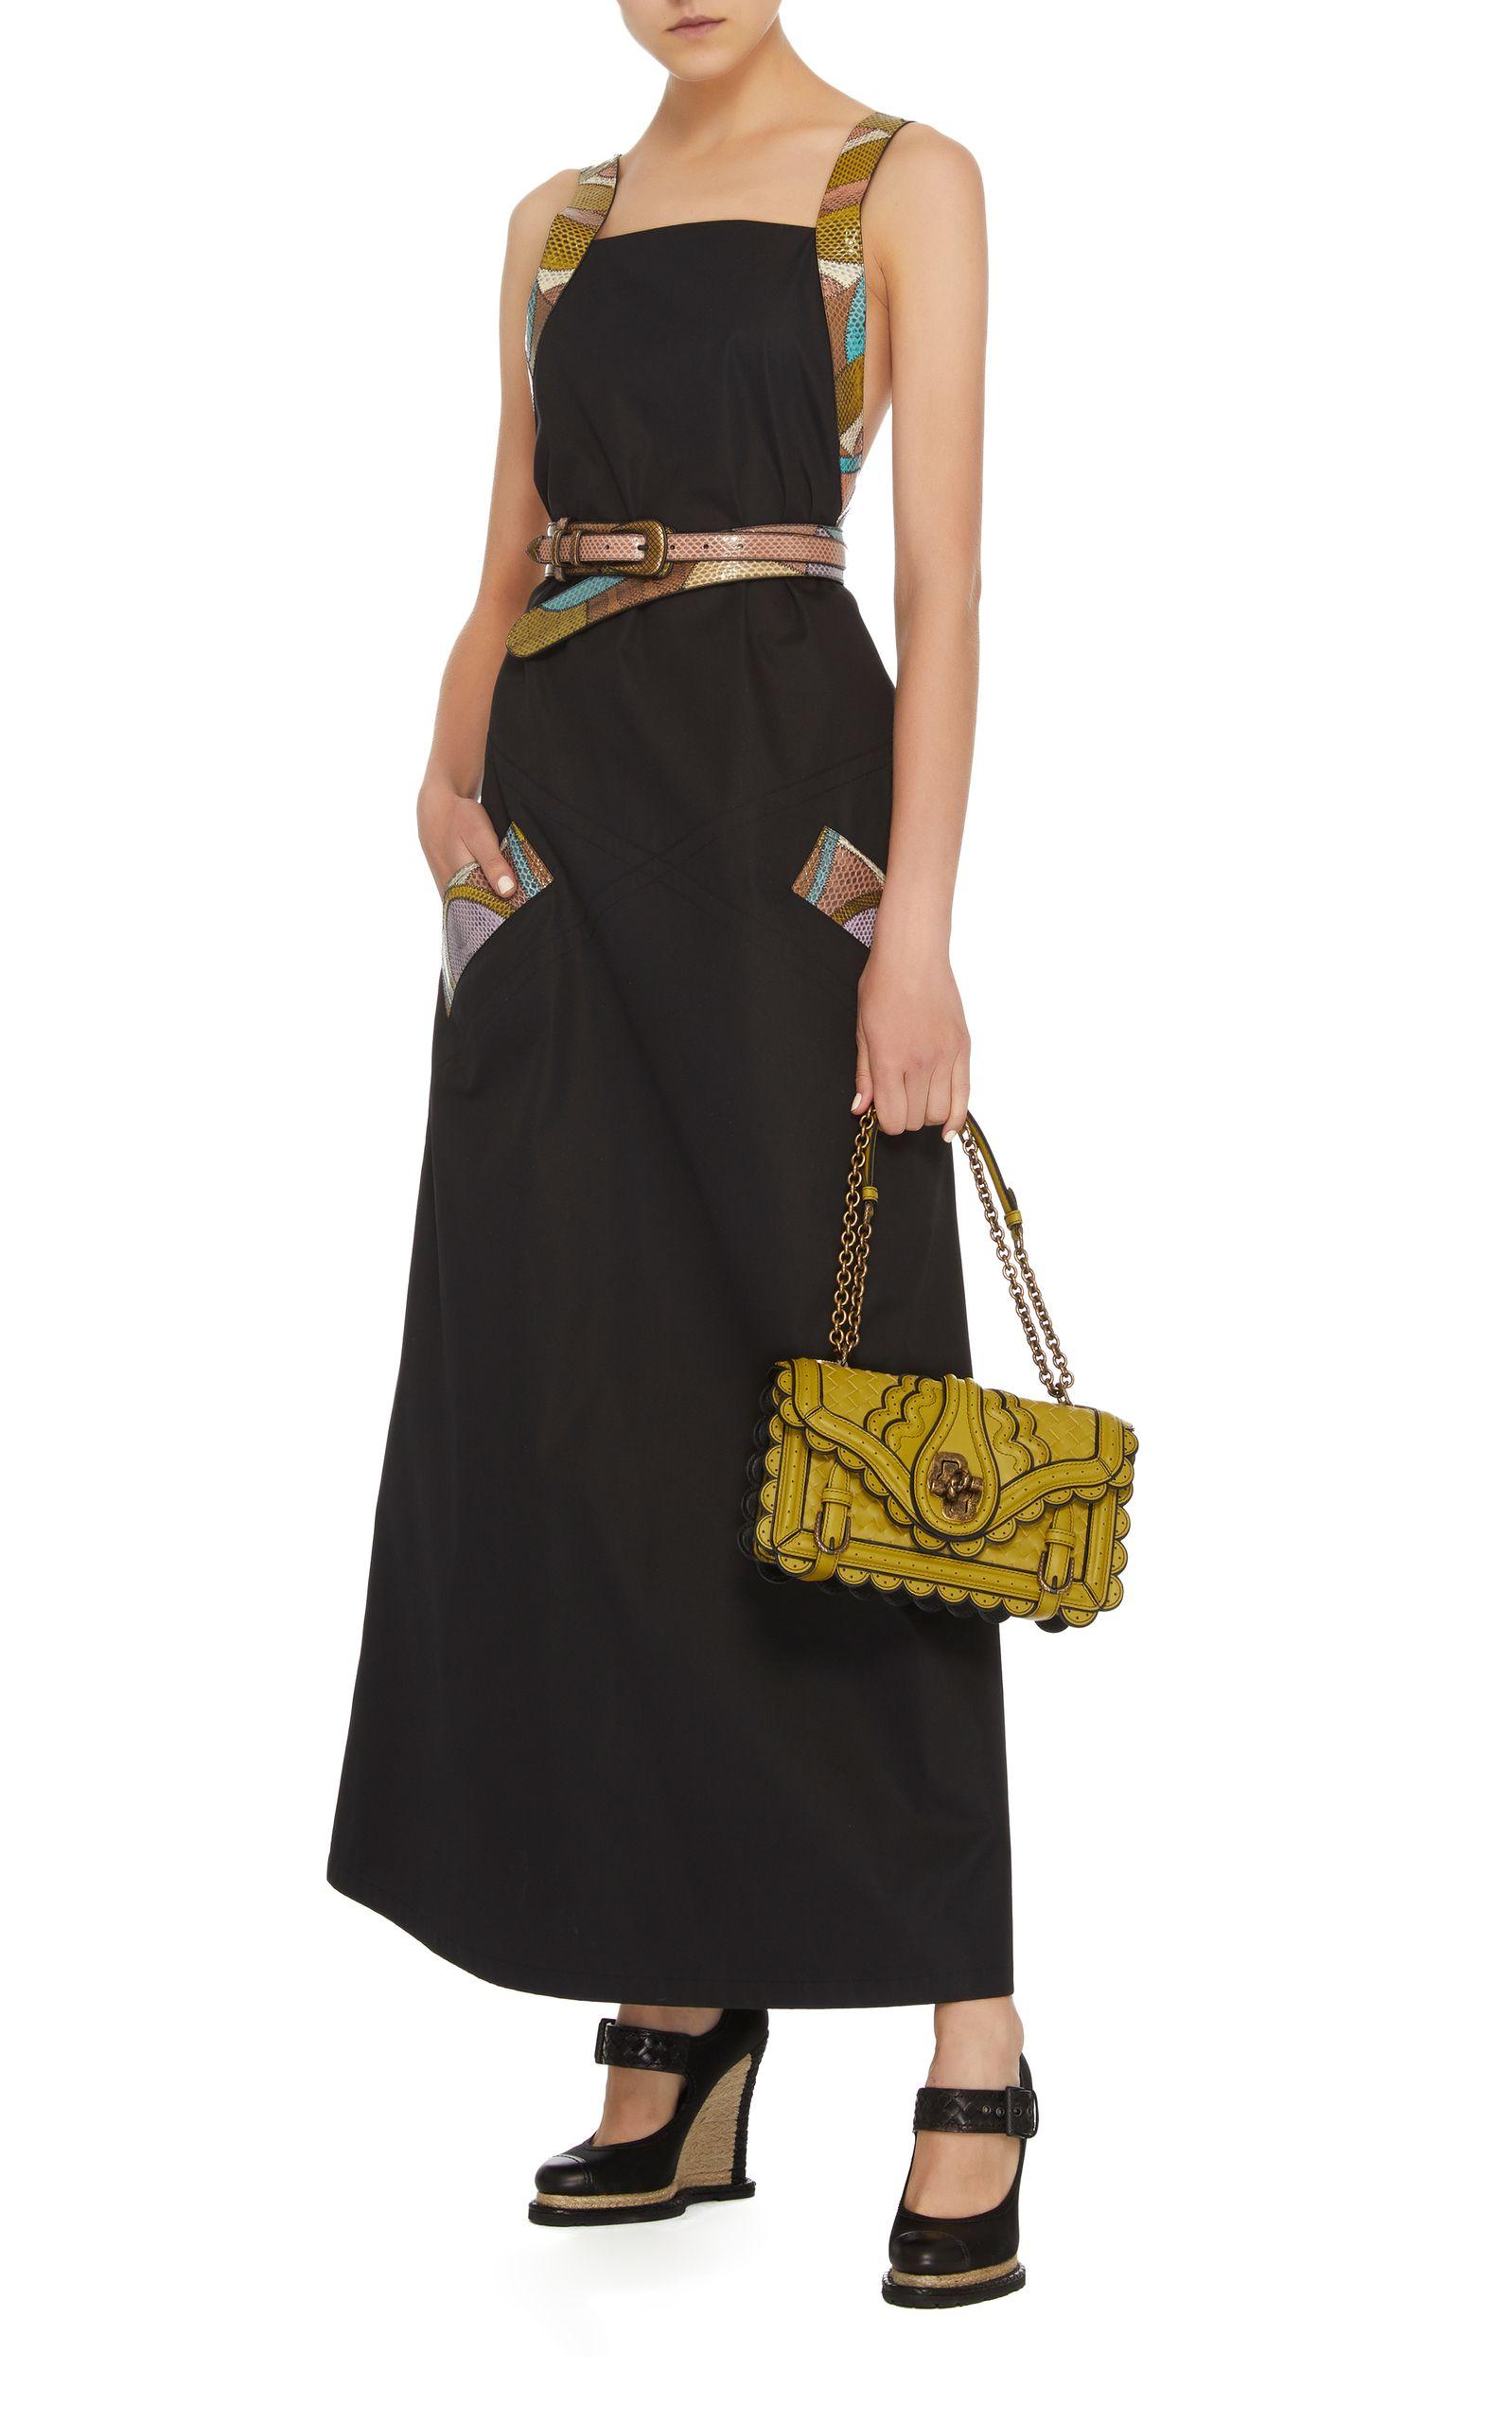 Cotton and Snakeskin Dress Bottega Veneta Cqnfq4NED